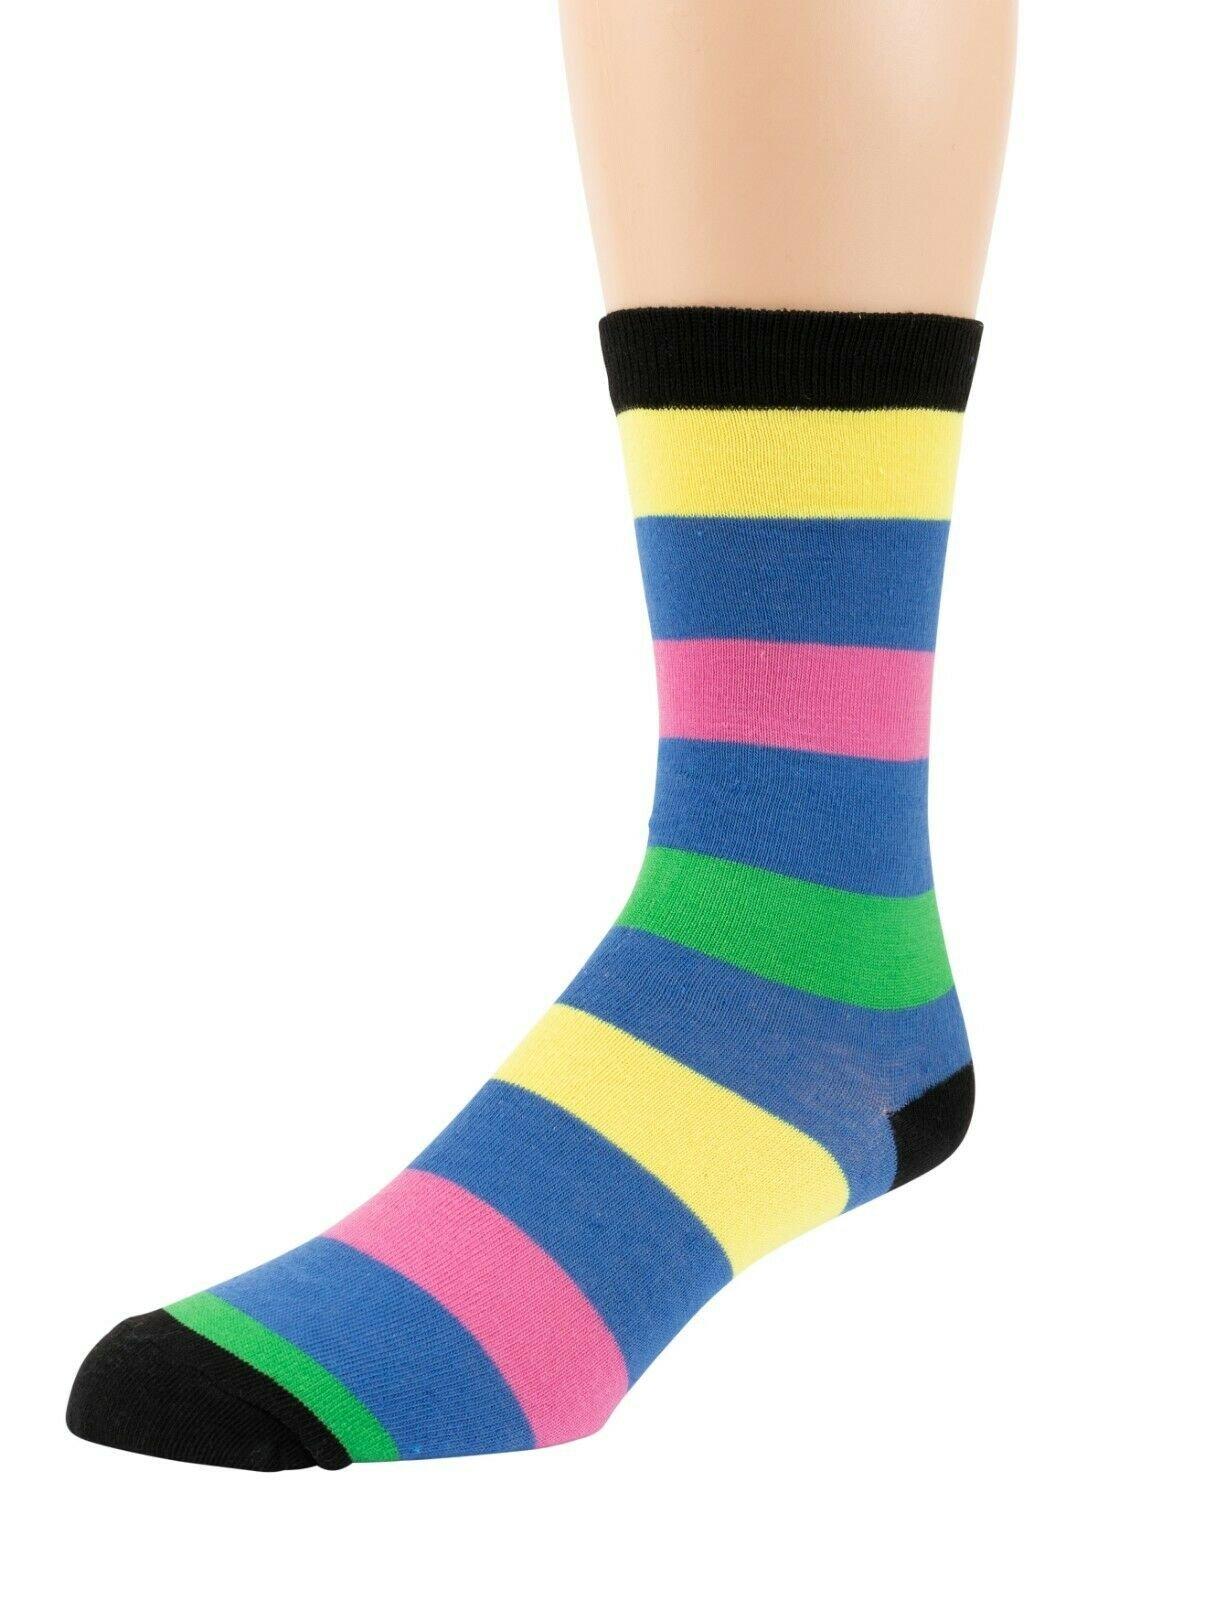 Mitch-Bogen-Mens-Cotton-Dress-Socks-Colorful-Fashion-Crew-Socks-8-Pack-Gift-Box thumbnail 43